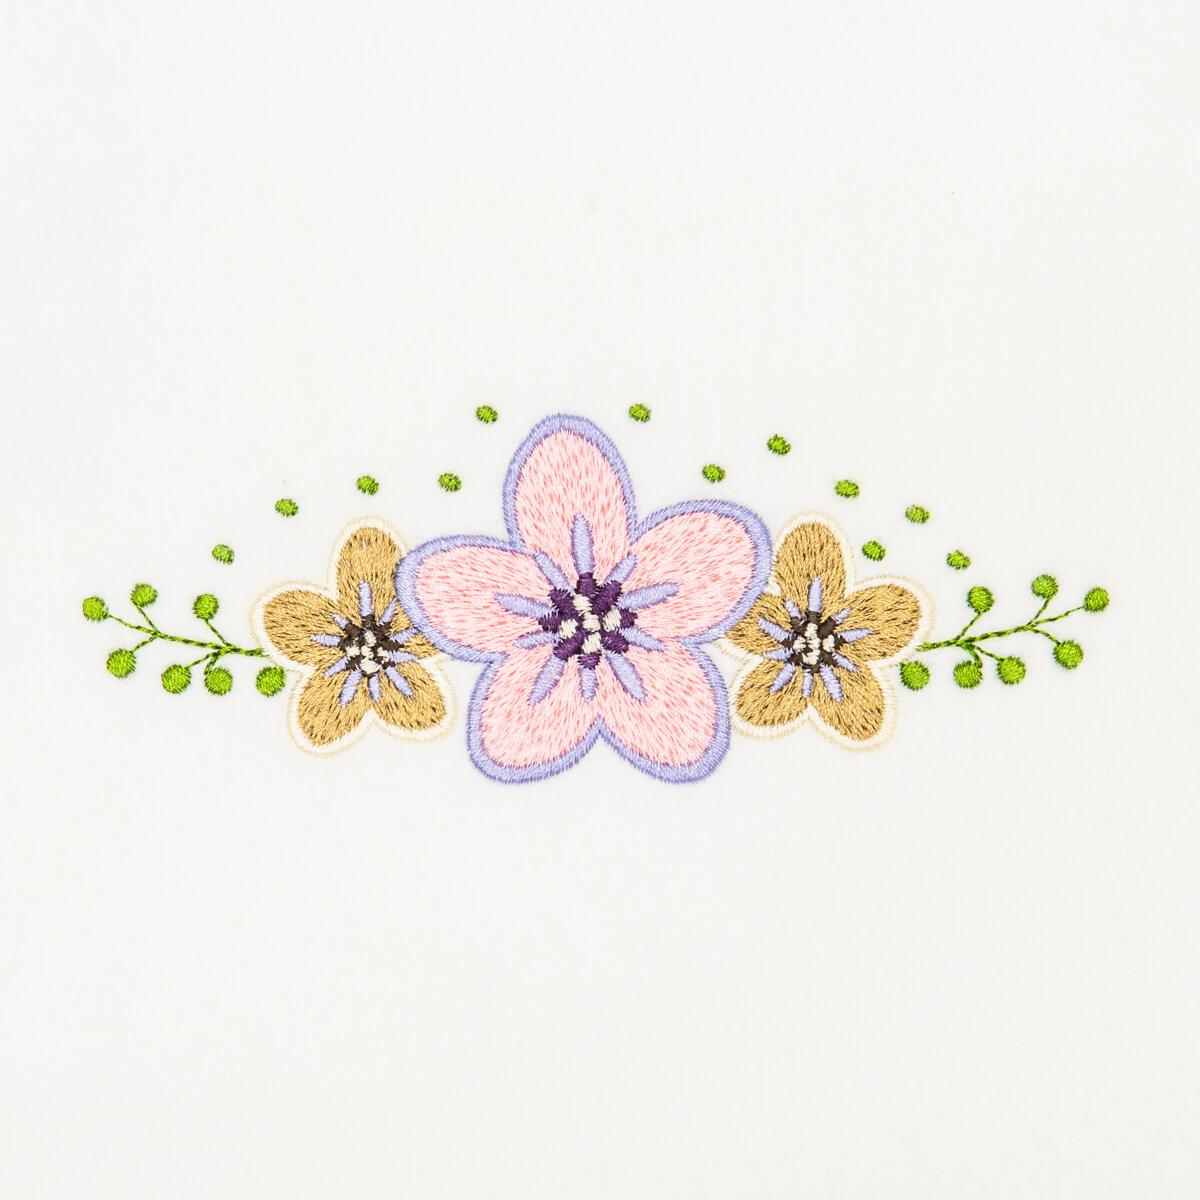 Matriz de bordado floral 422